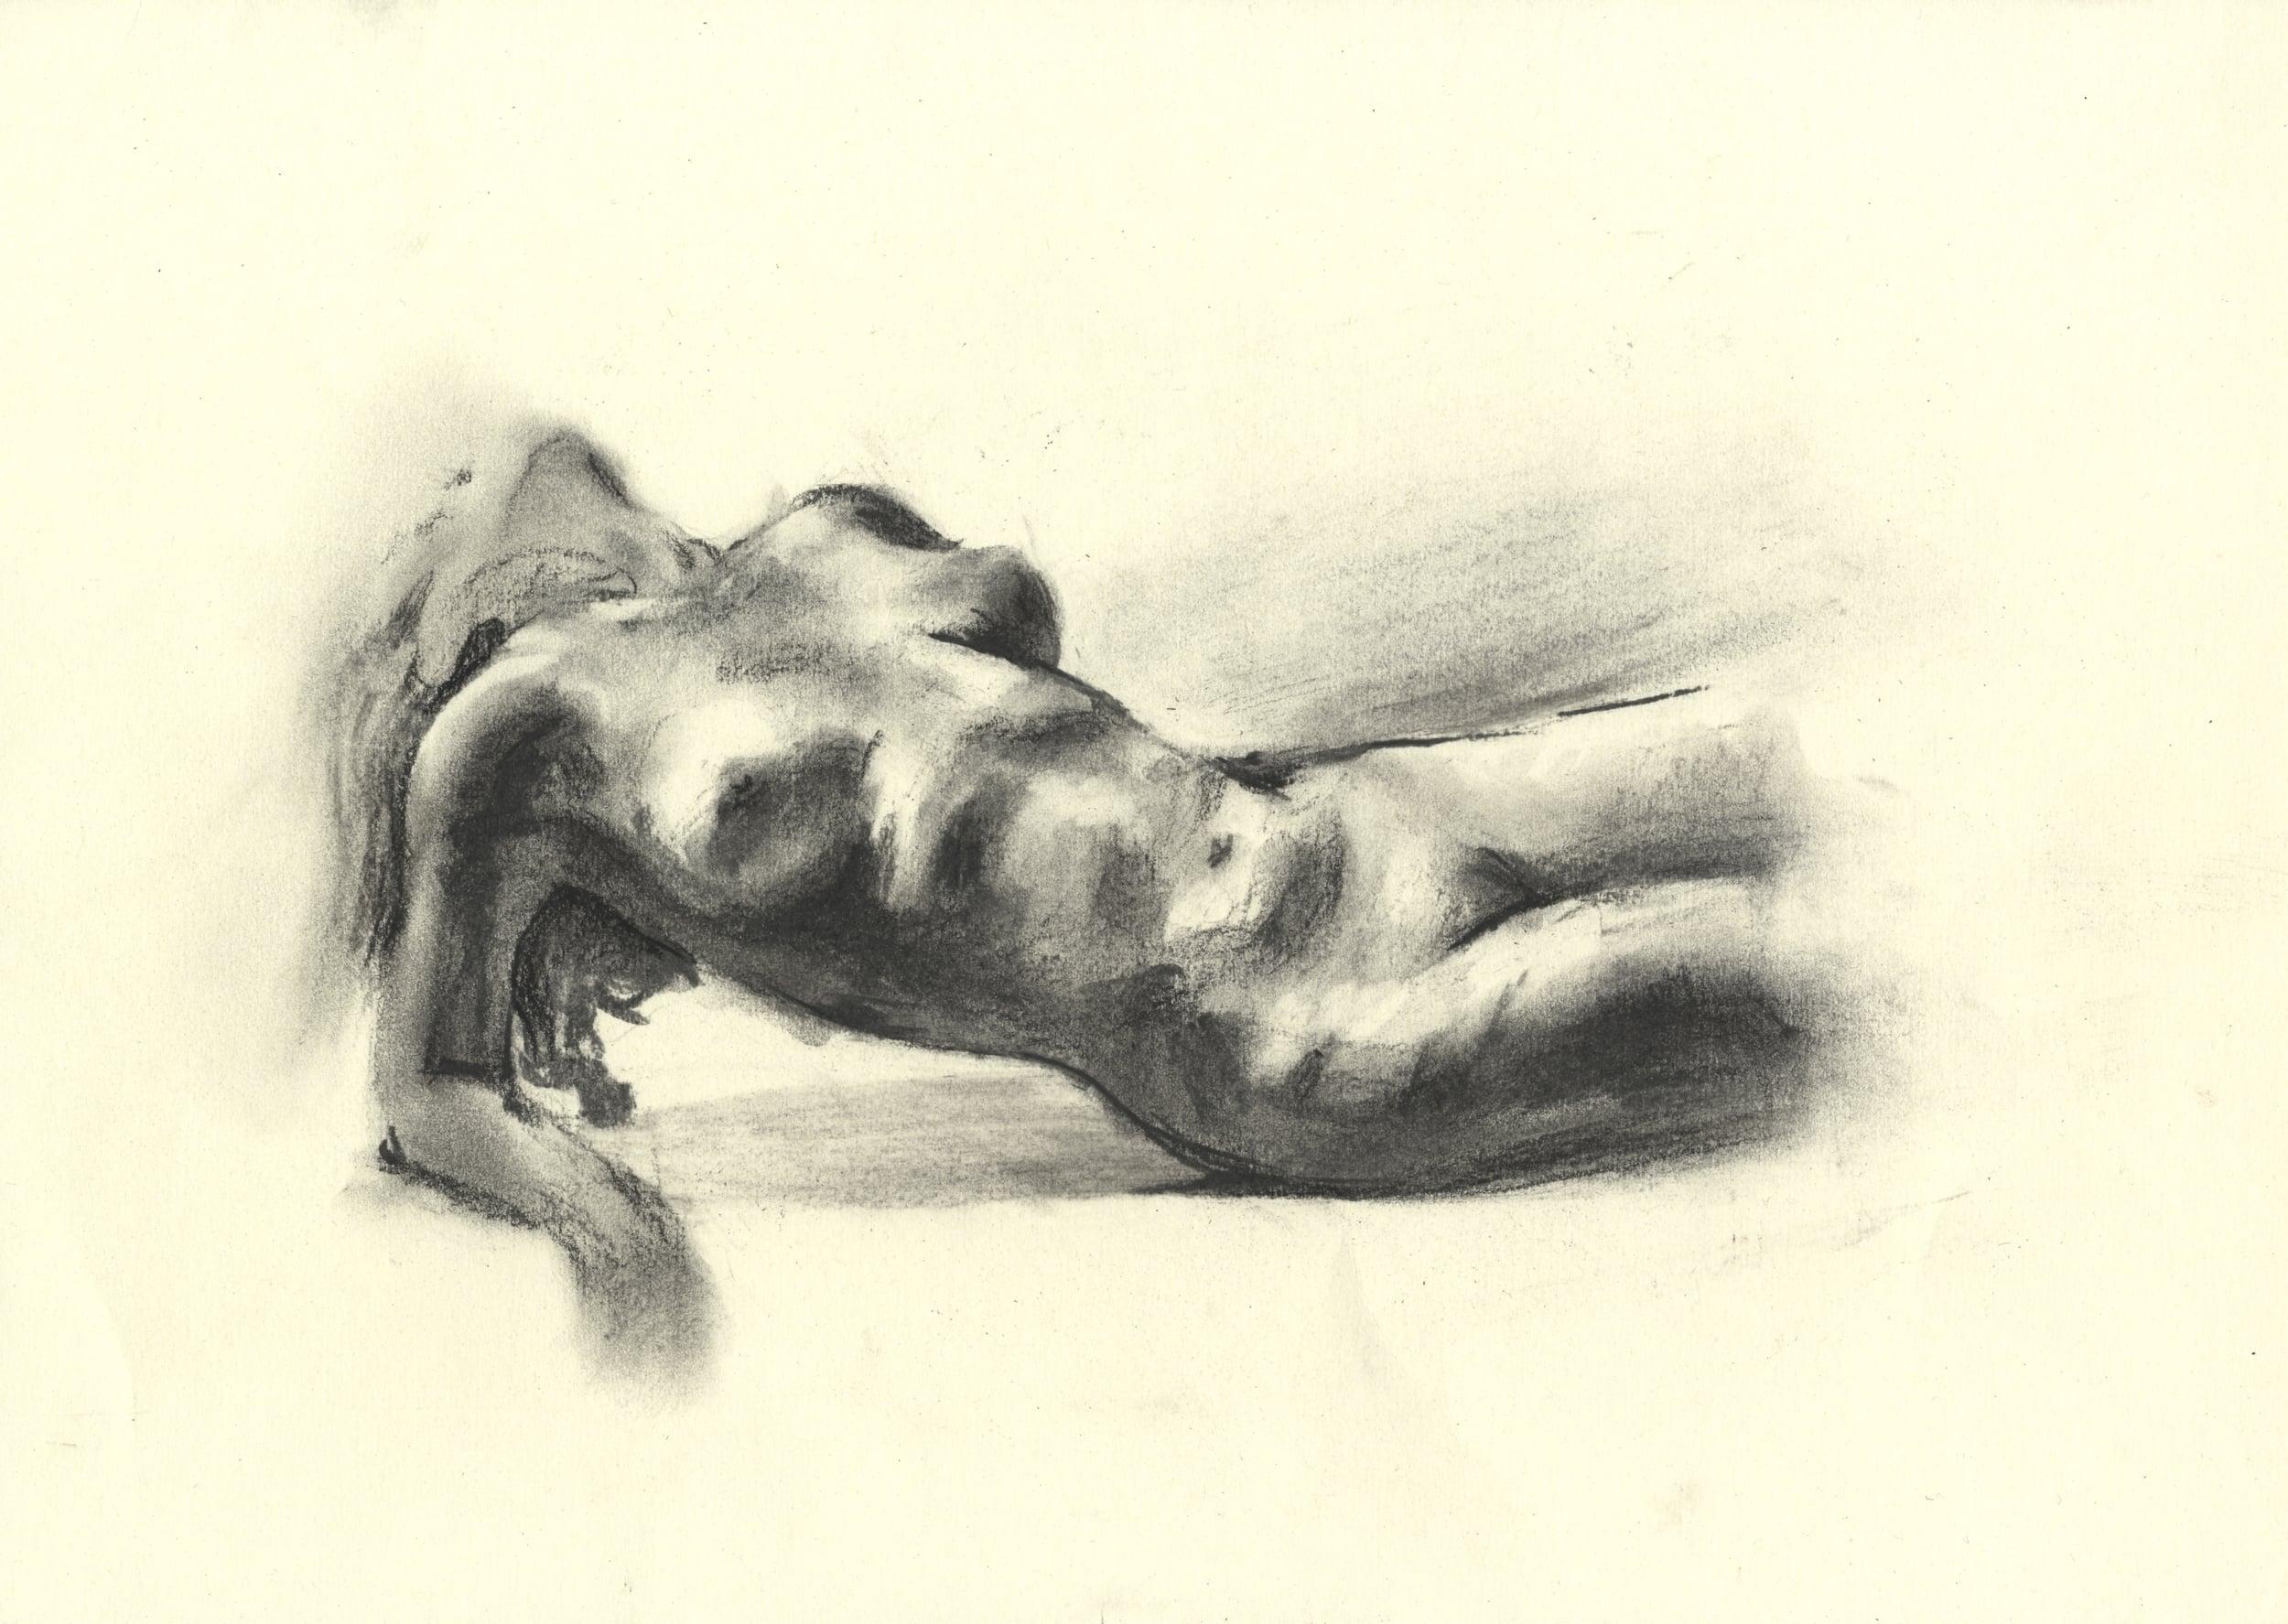 croquis drawing